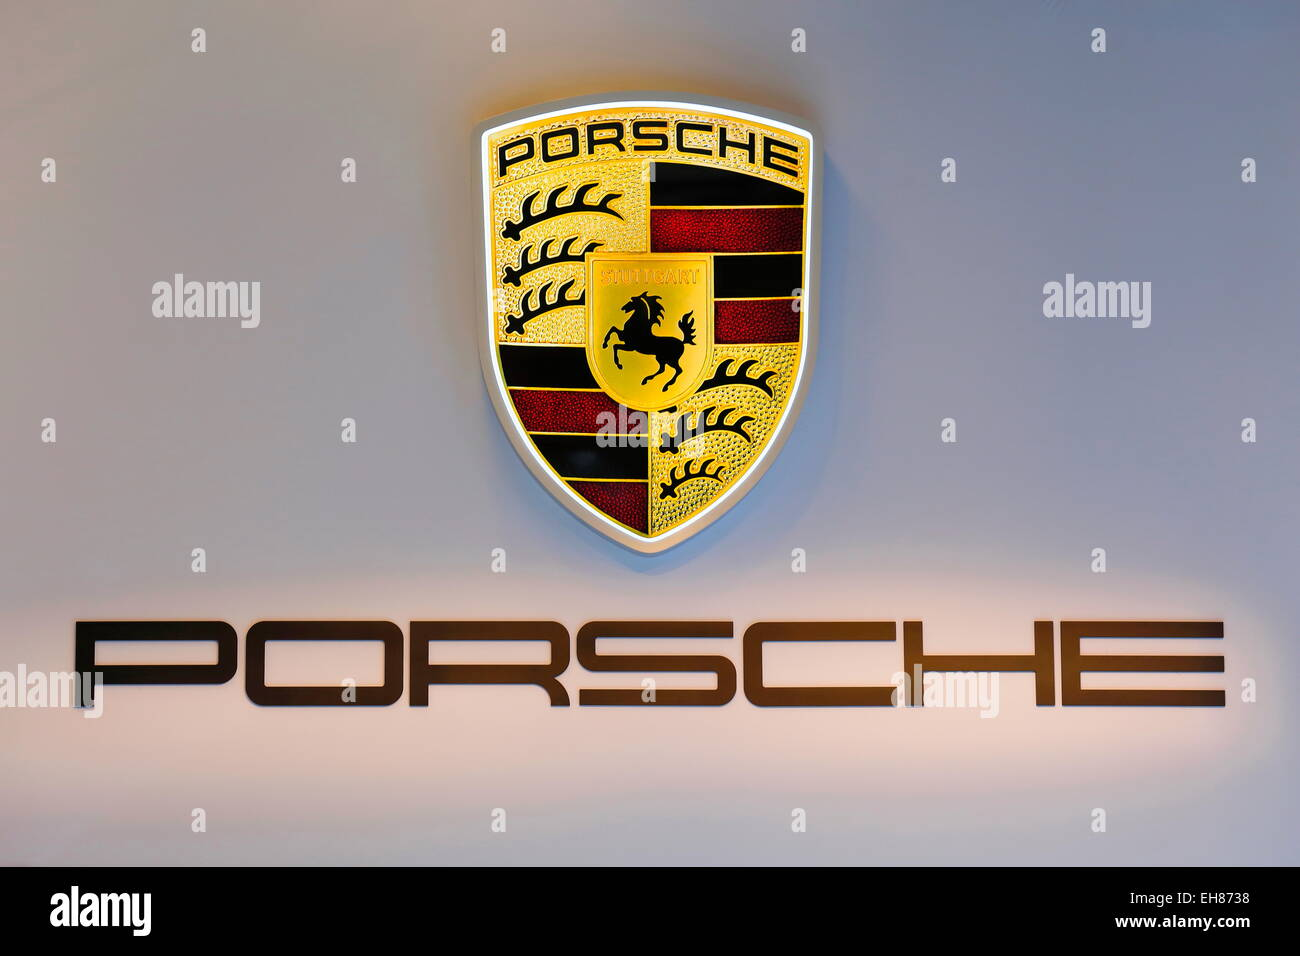 Porsche Company Logo Salon De L Automobile Montreal Quebec Stock